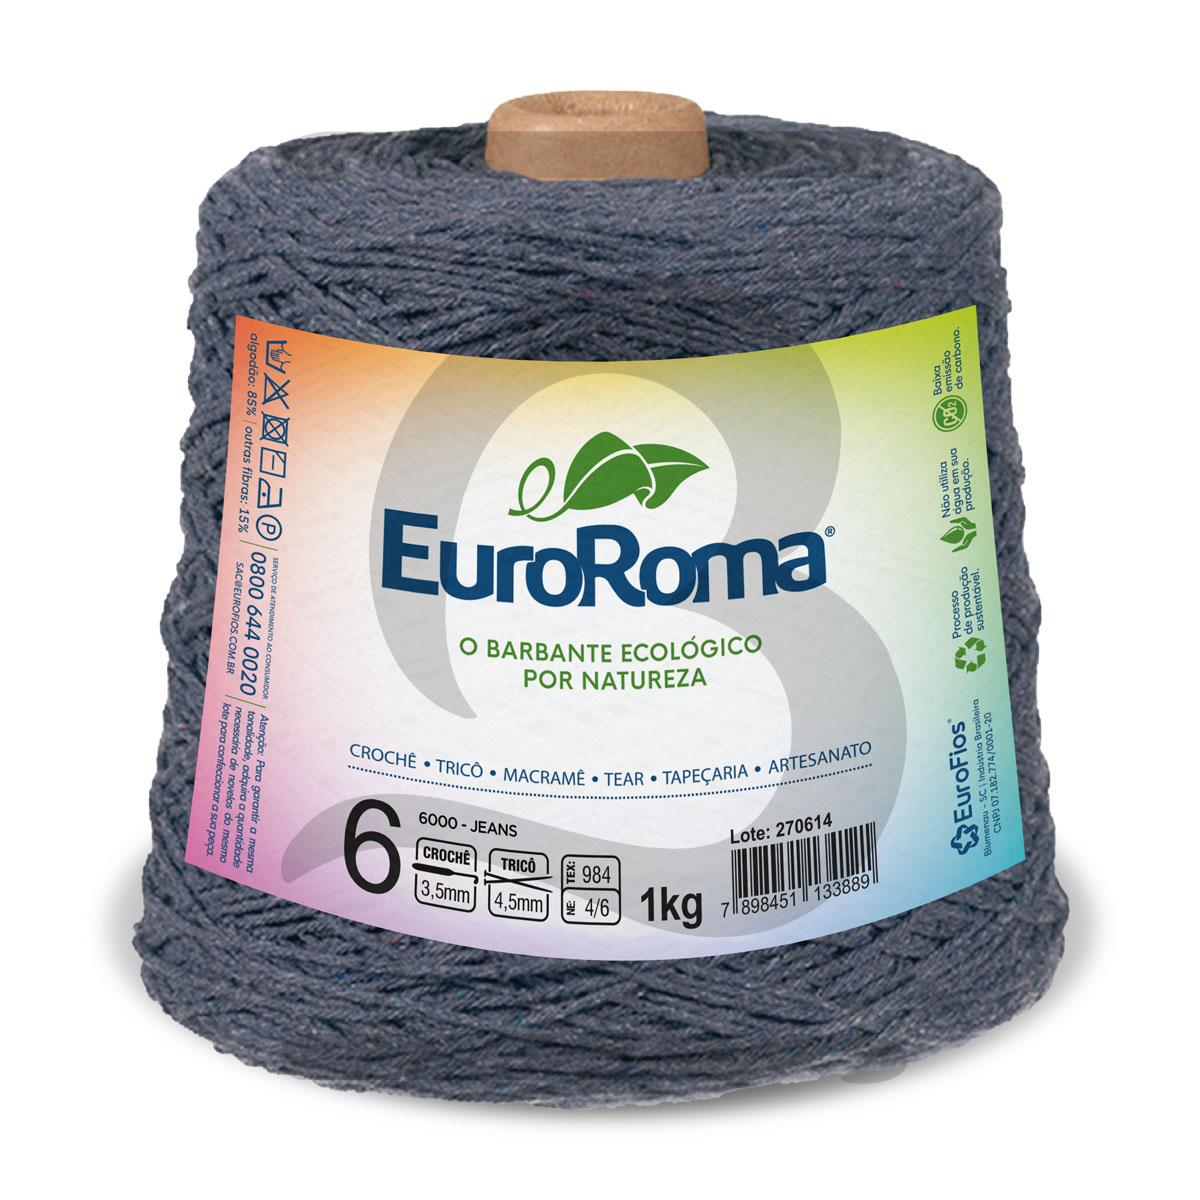 Barbante EuroRoma Colorido N°6 - 1kg Cor 6000 Jeans